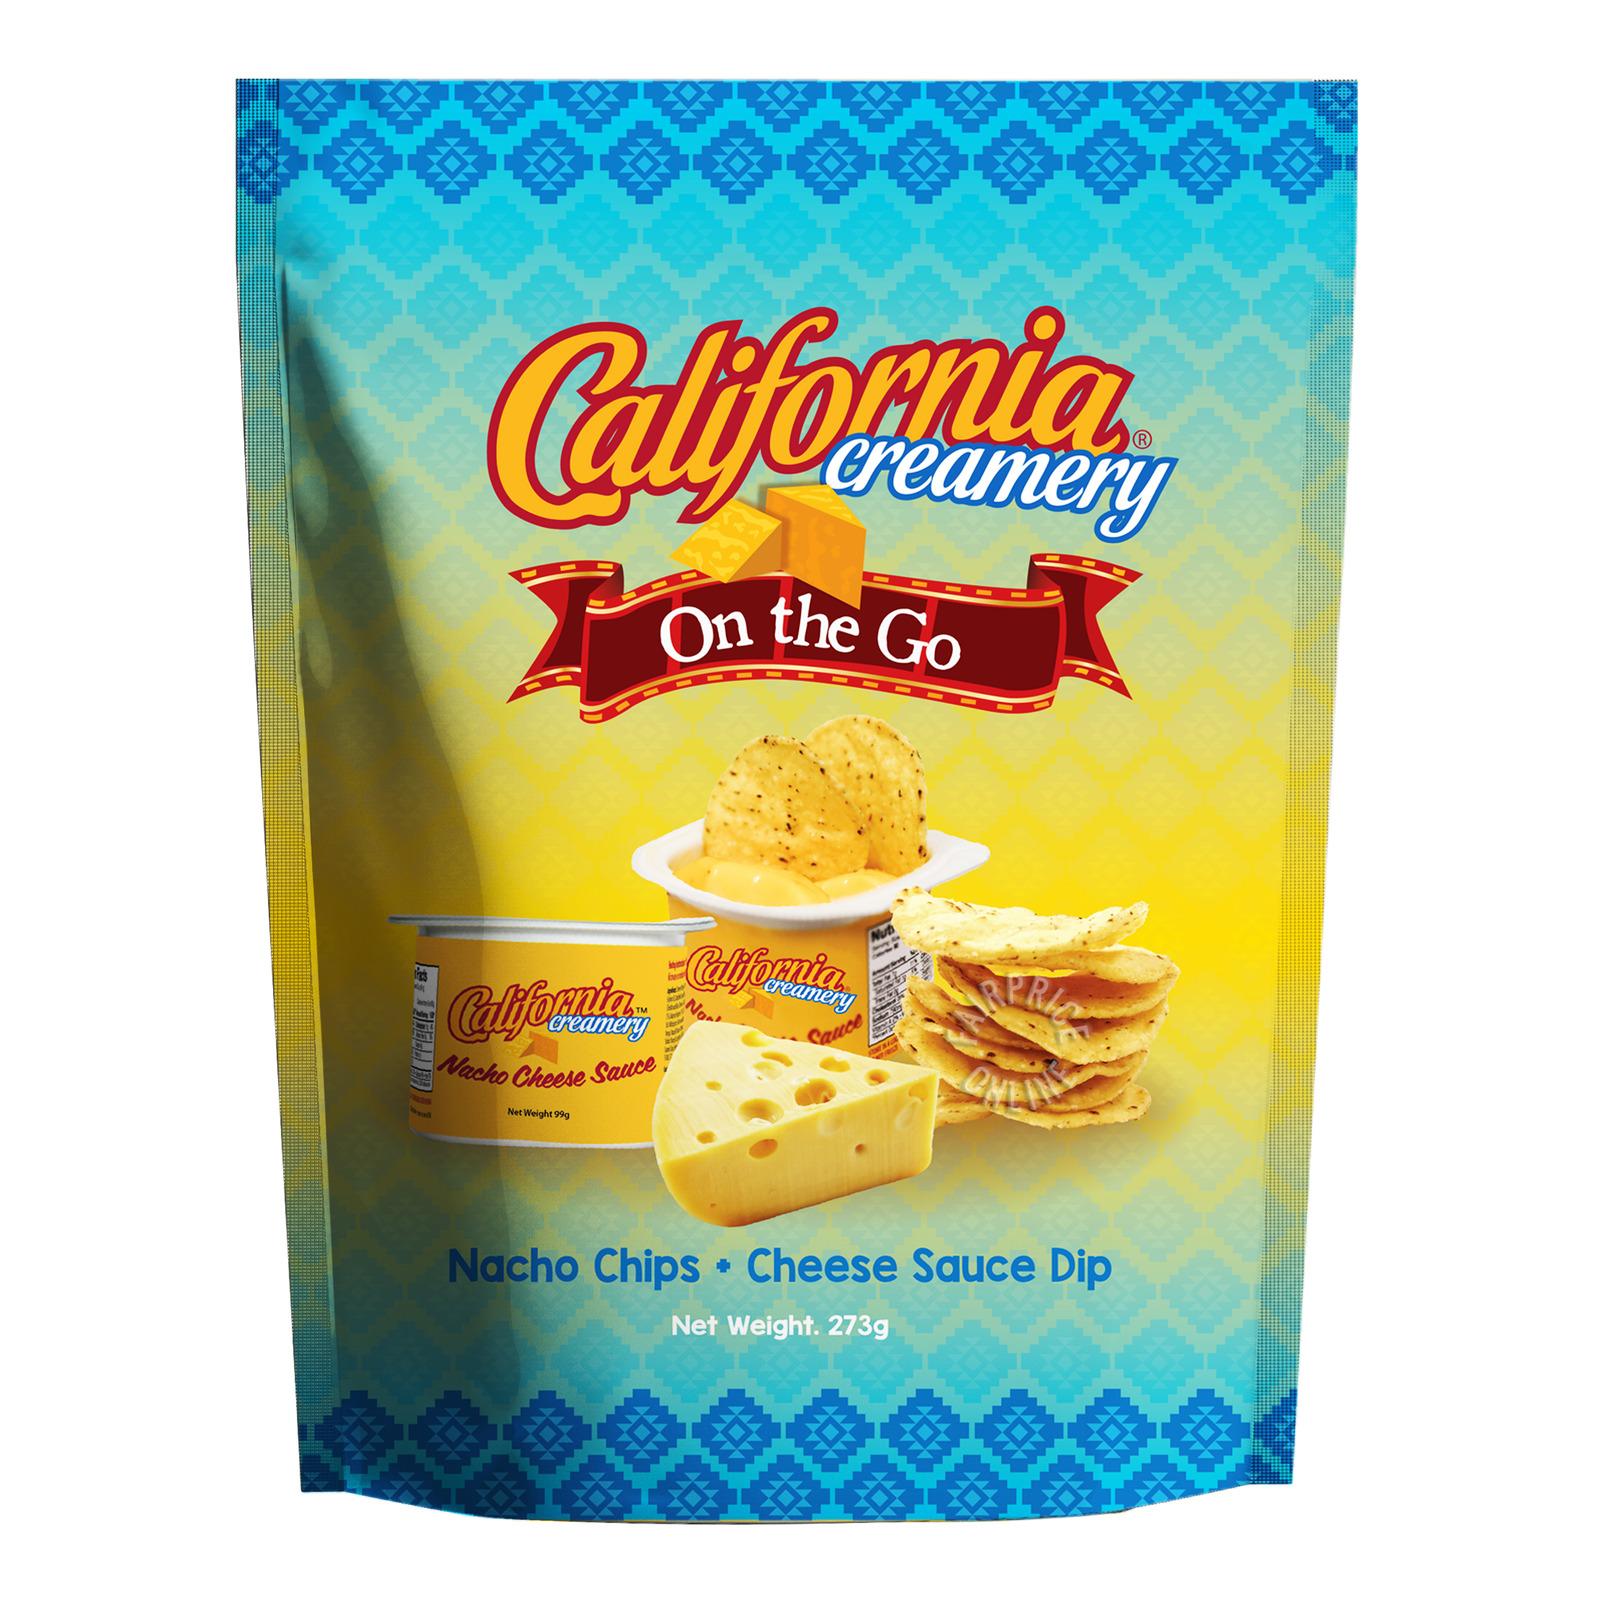 California Creamery Tortilla Chips - Nacho Cheese Sauce